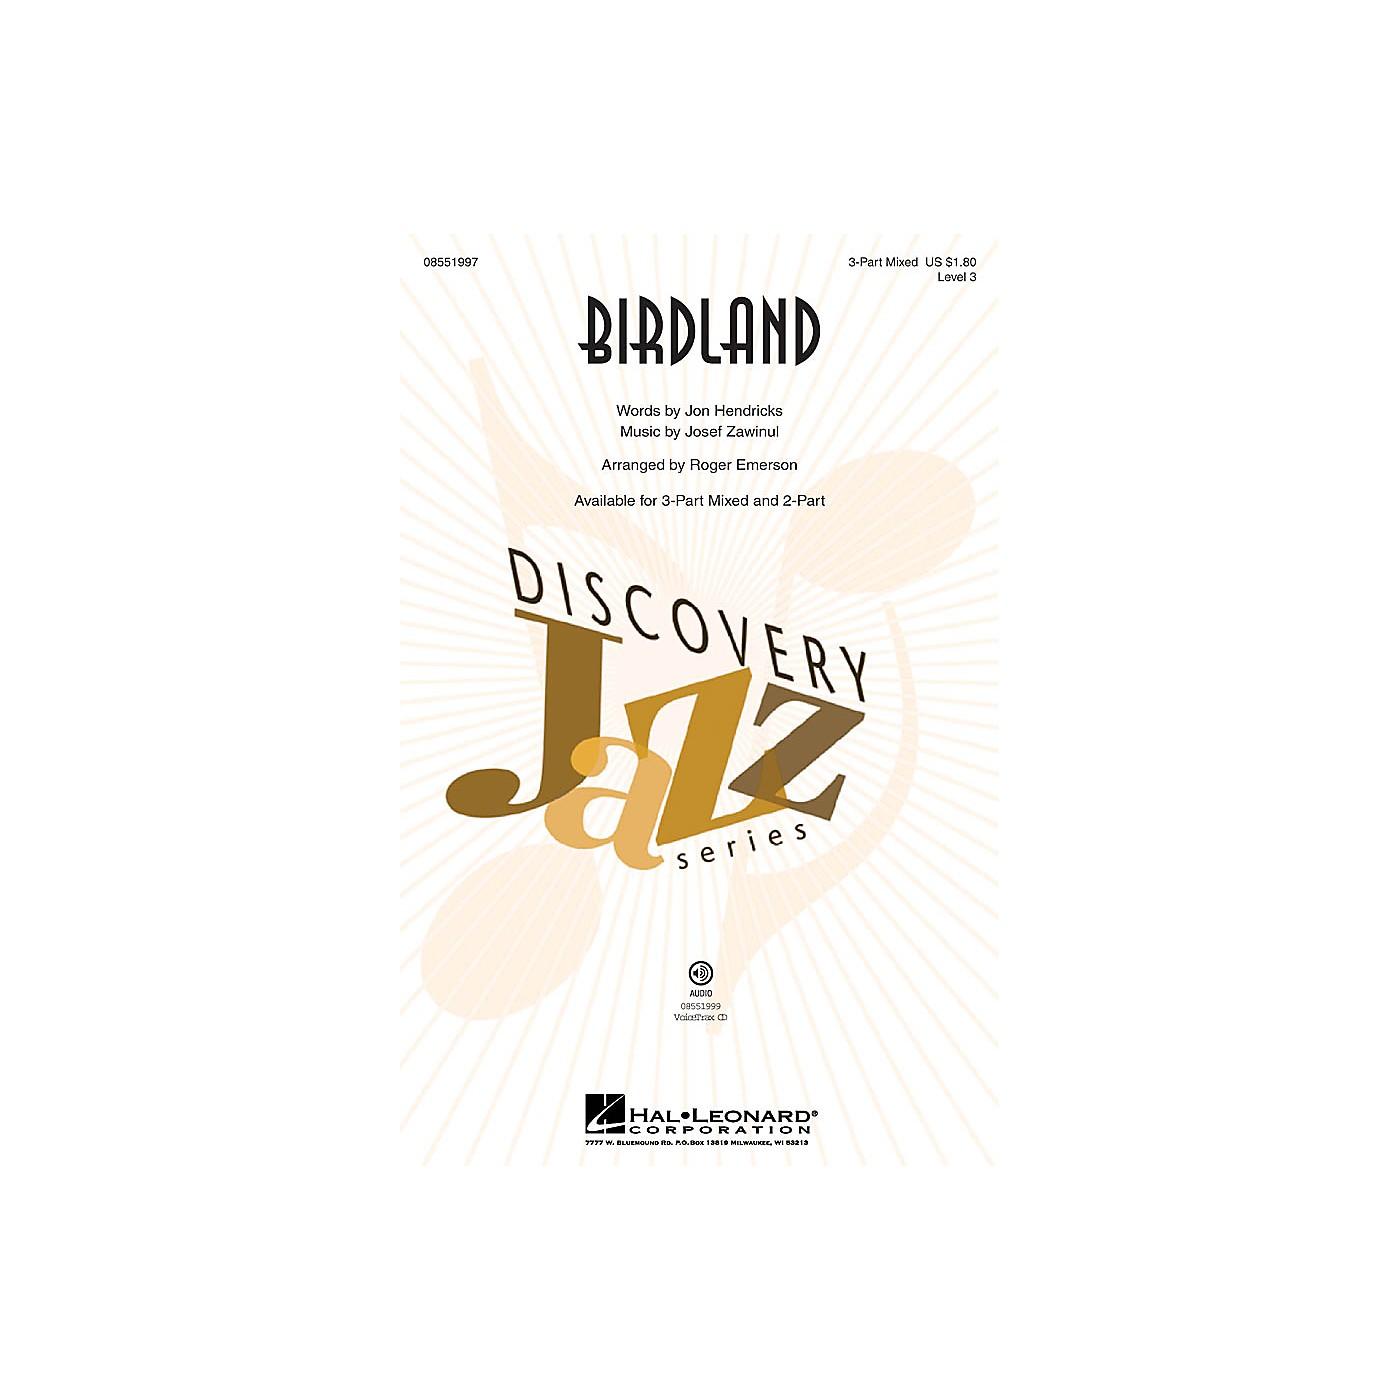 Hal Leonard Birdland (Discovery Level 3) 3-Part Mixed arranged by Roger Emerson thumbnail